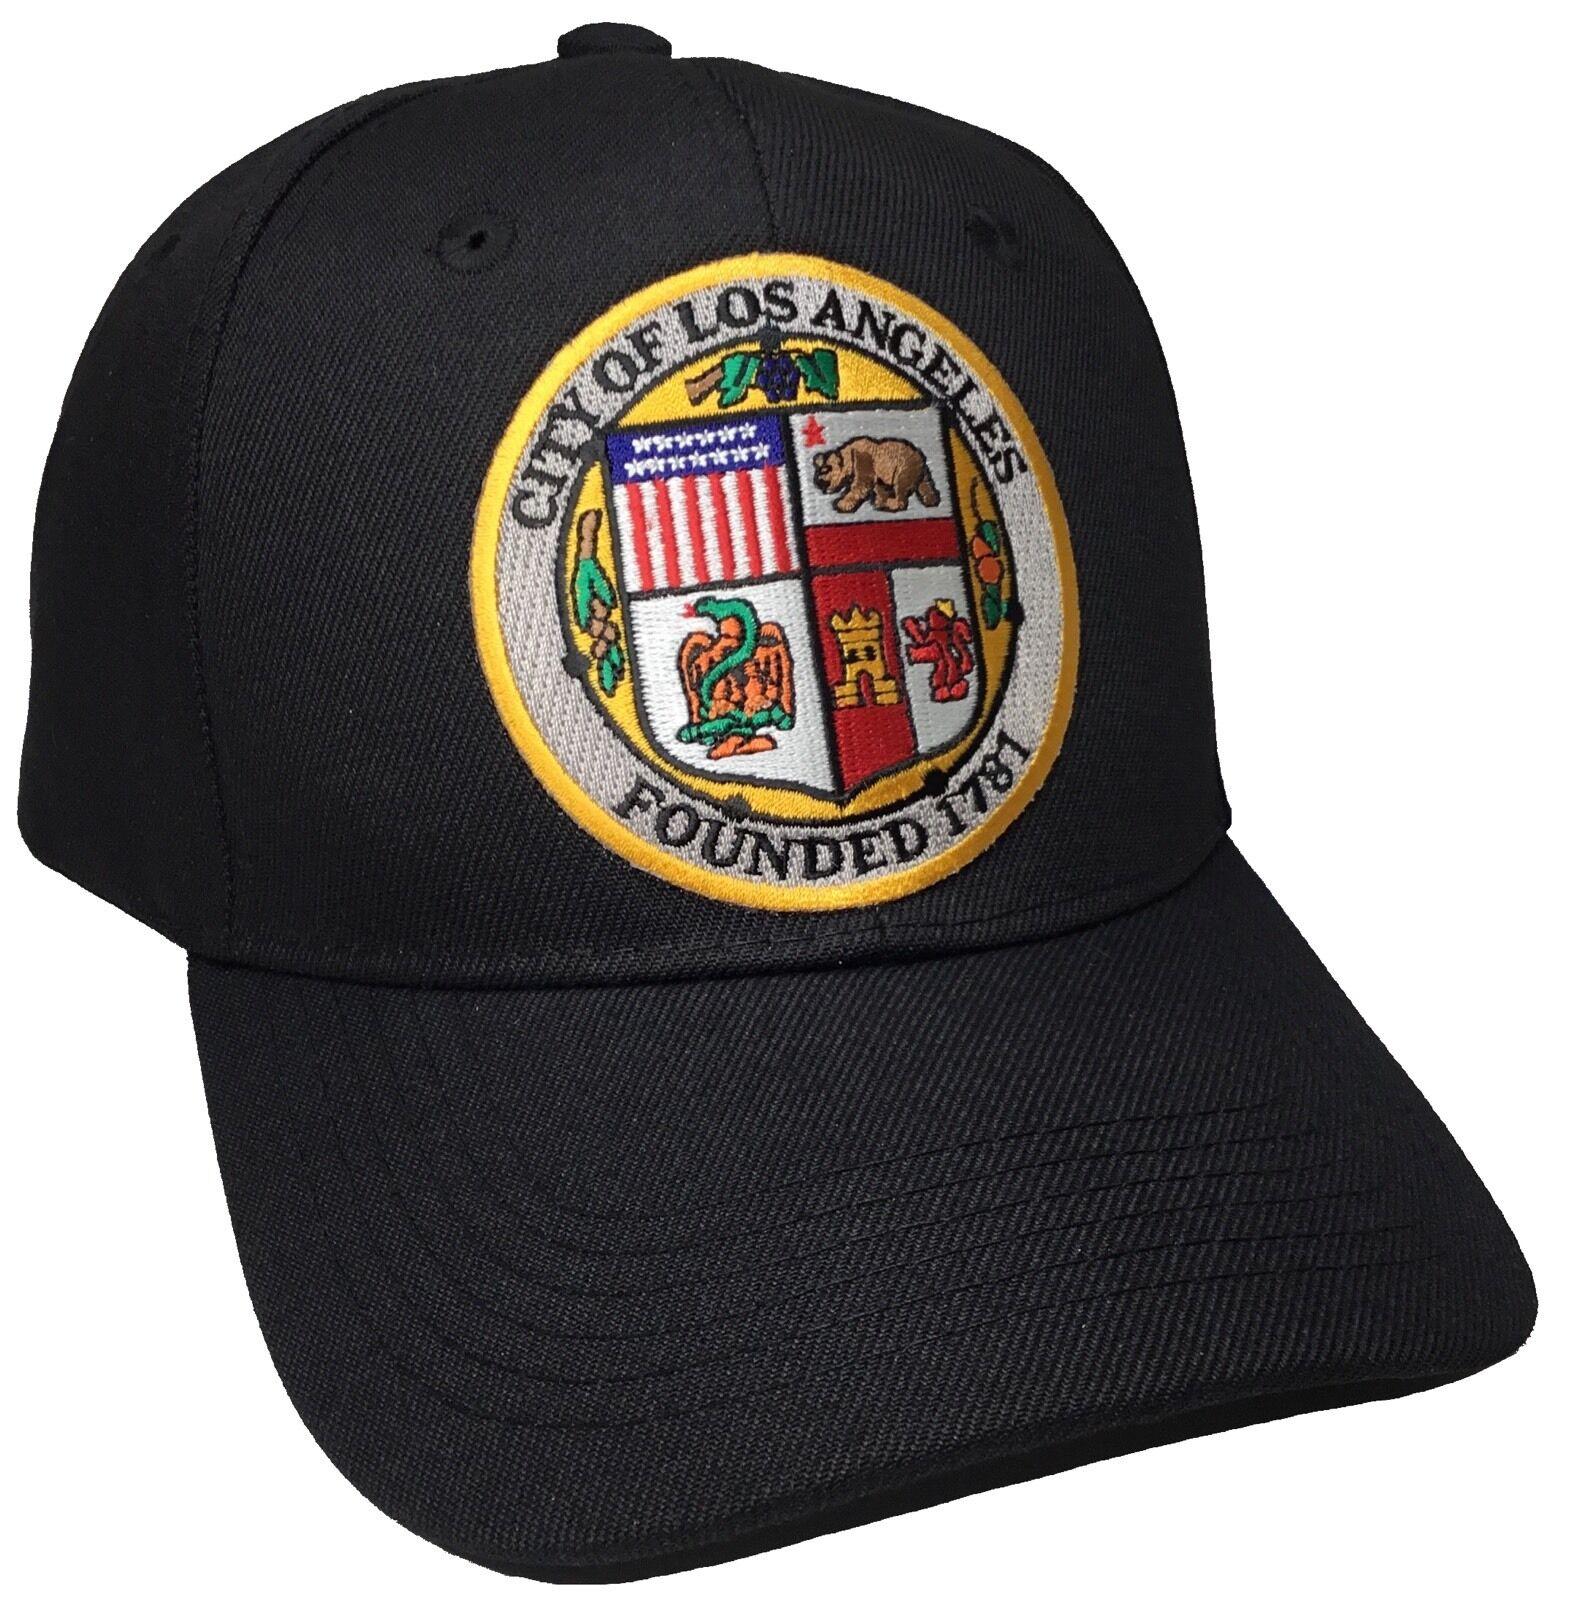 City Of Black Los Angeles Hat Color Black Of Adjustable 53e2ba